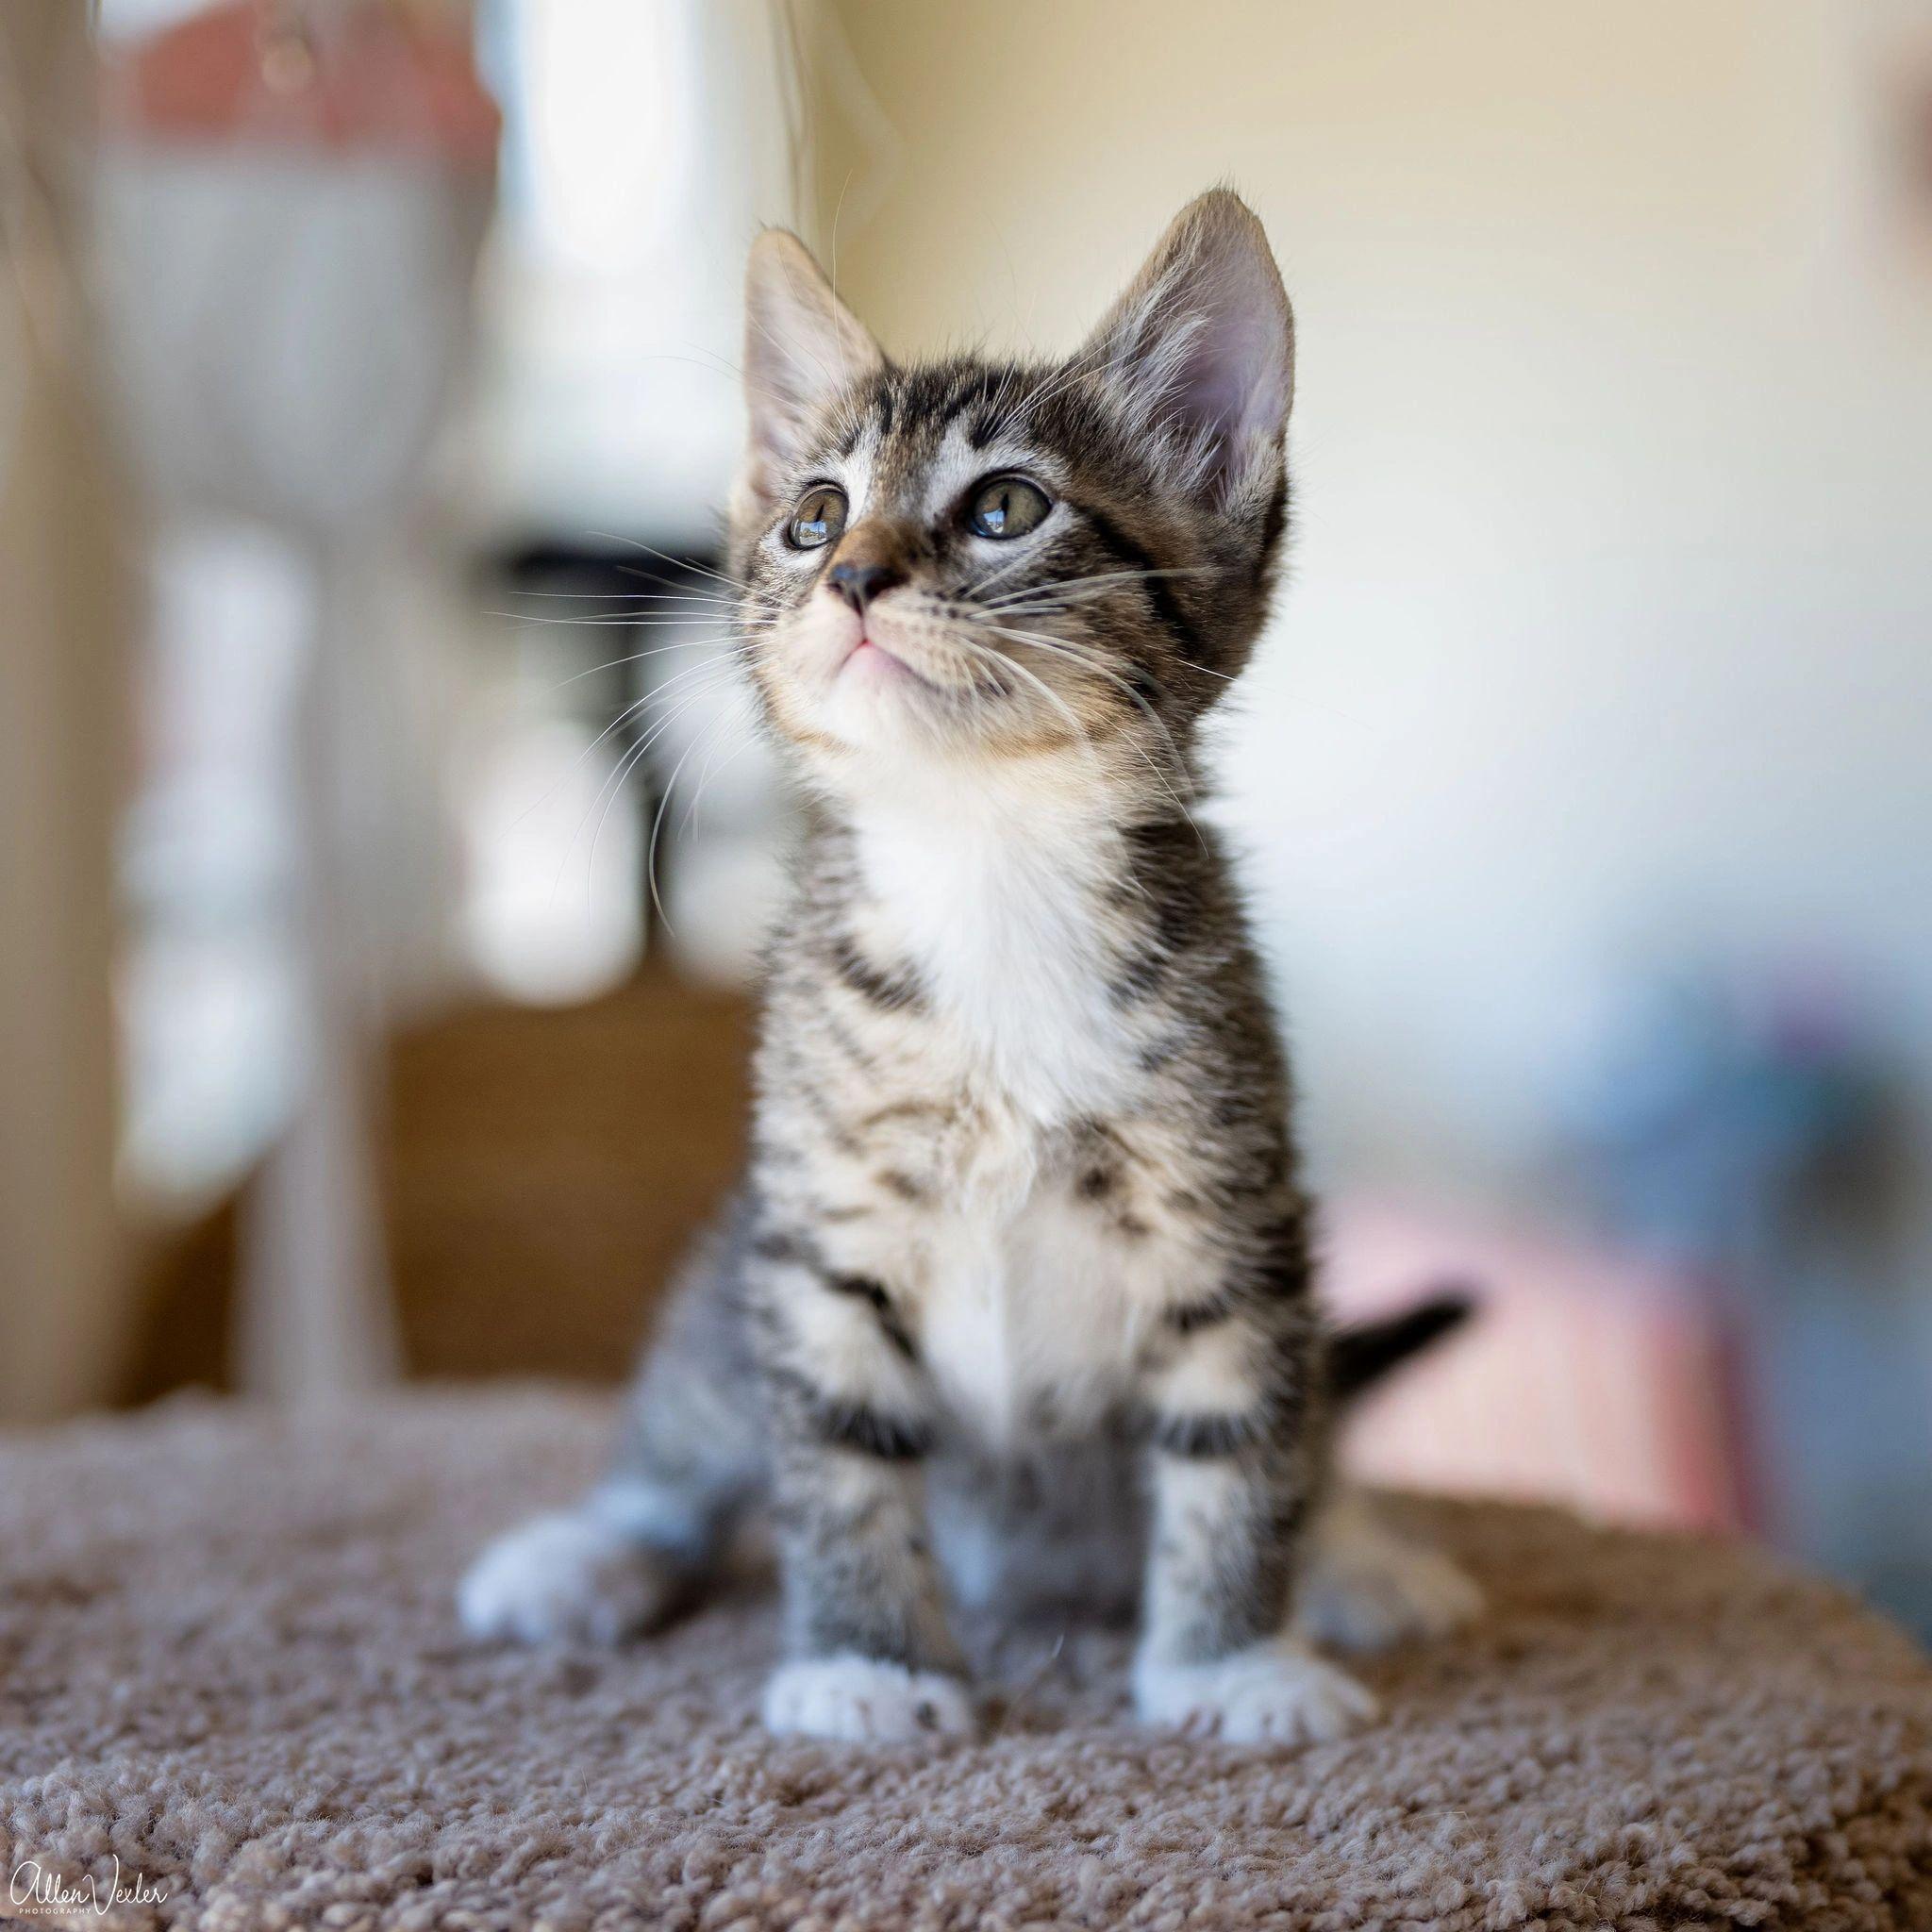 Cats Center | Dwarf kittens, Cats, Tiny cats